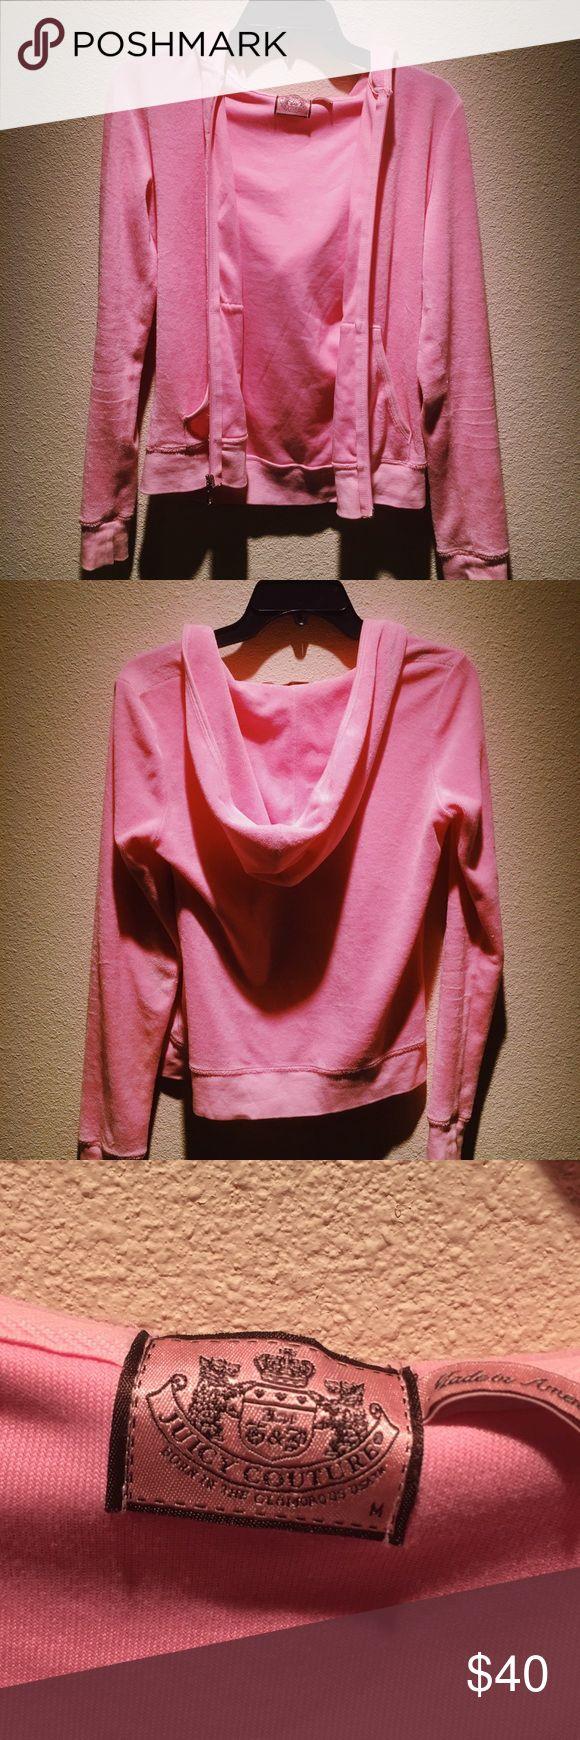 Juicy couture jacket Barely worn pink juicy couture jacket in size medium Juicy Couture Jackets & Coats